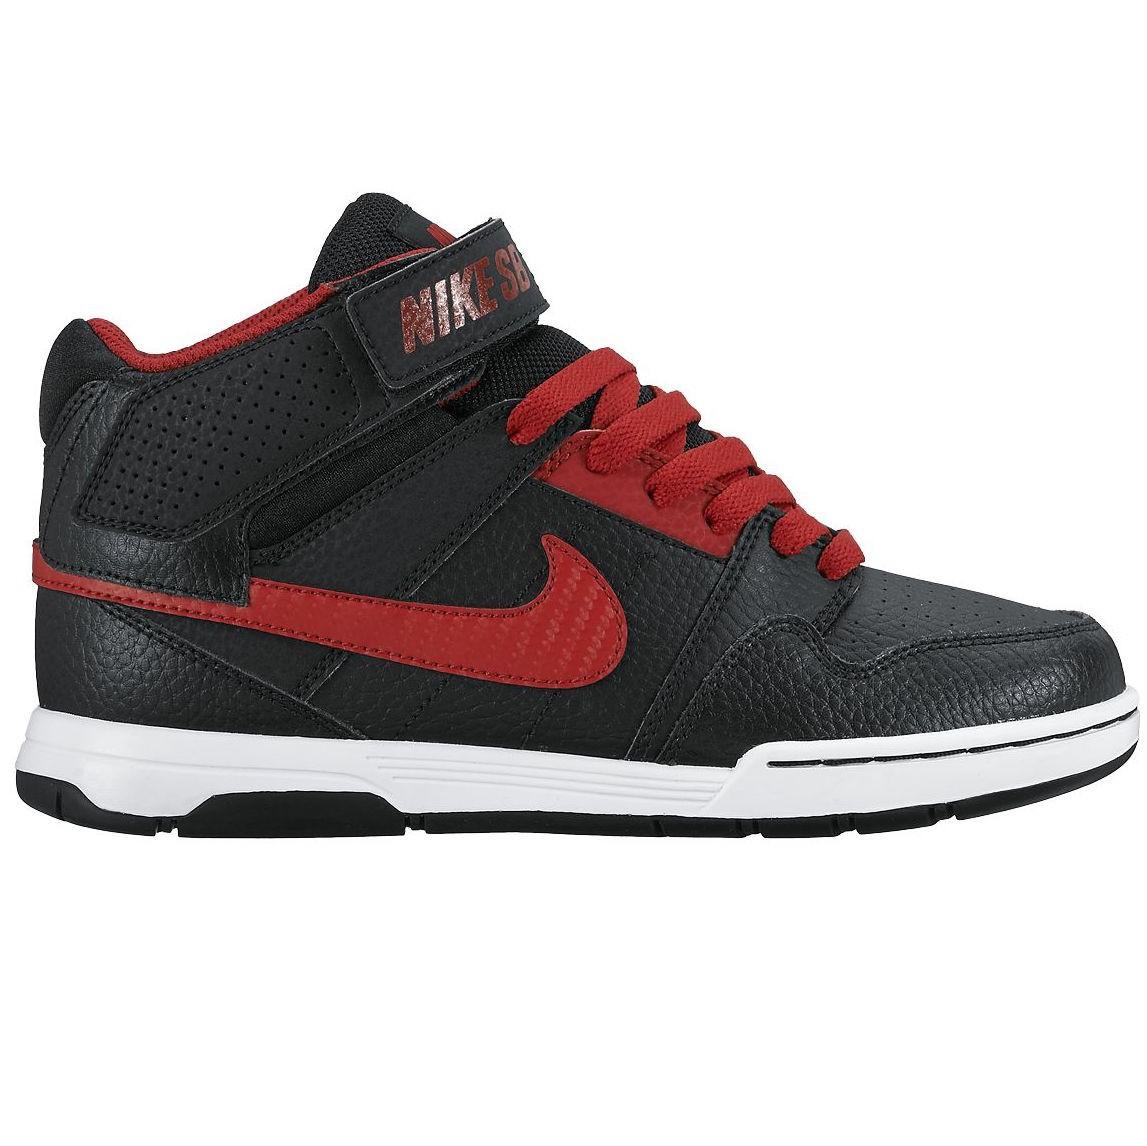 Dětské boty Nike MOGAN MID 2 JR B  677e245f2d